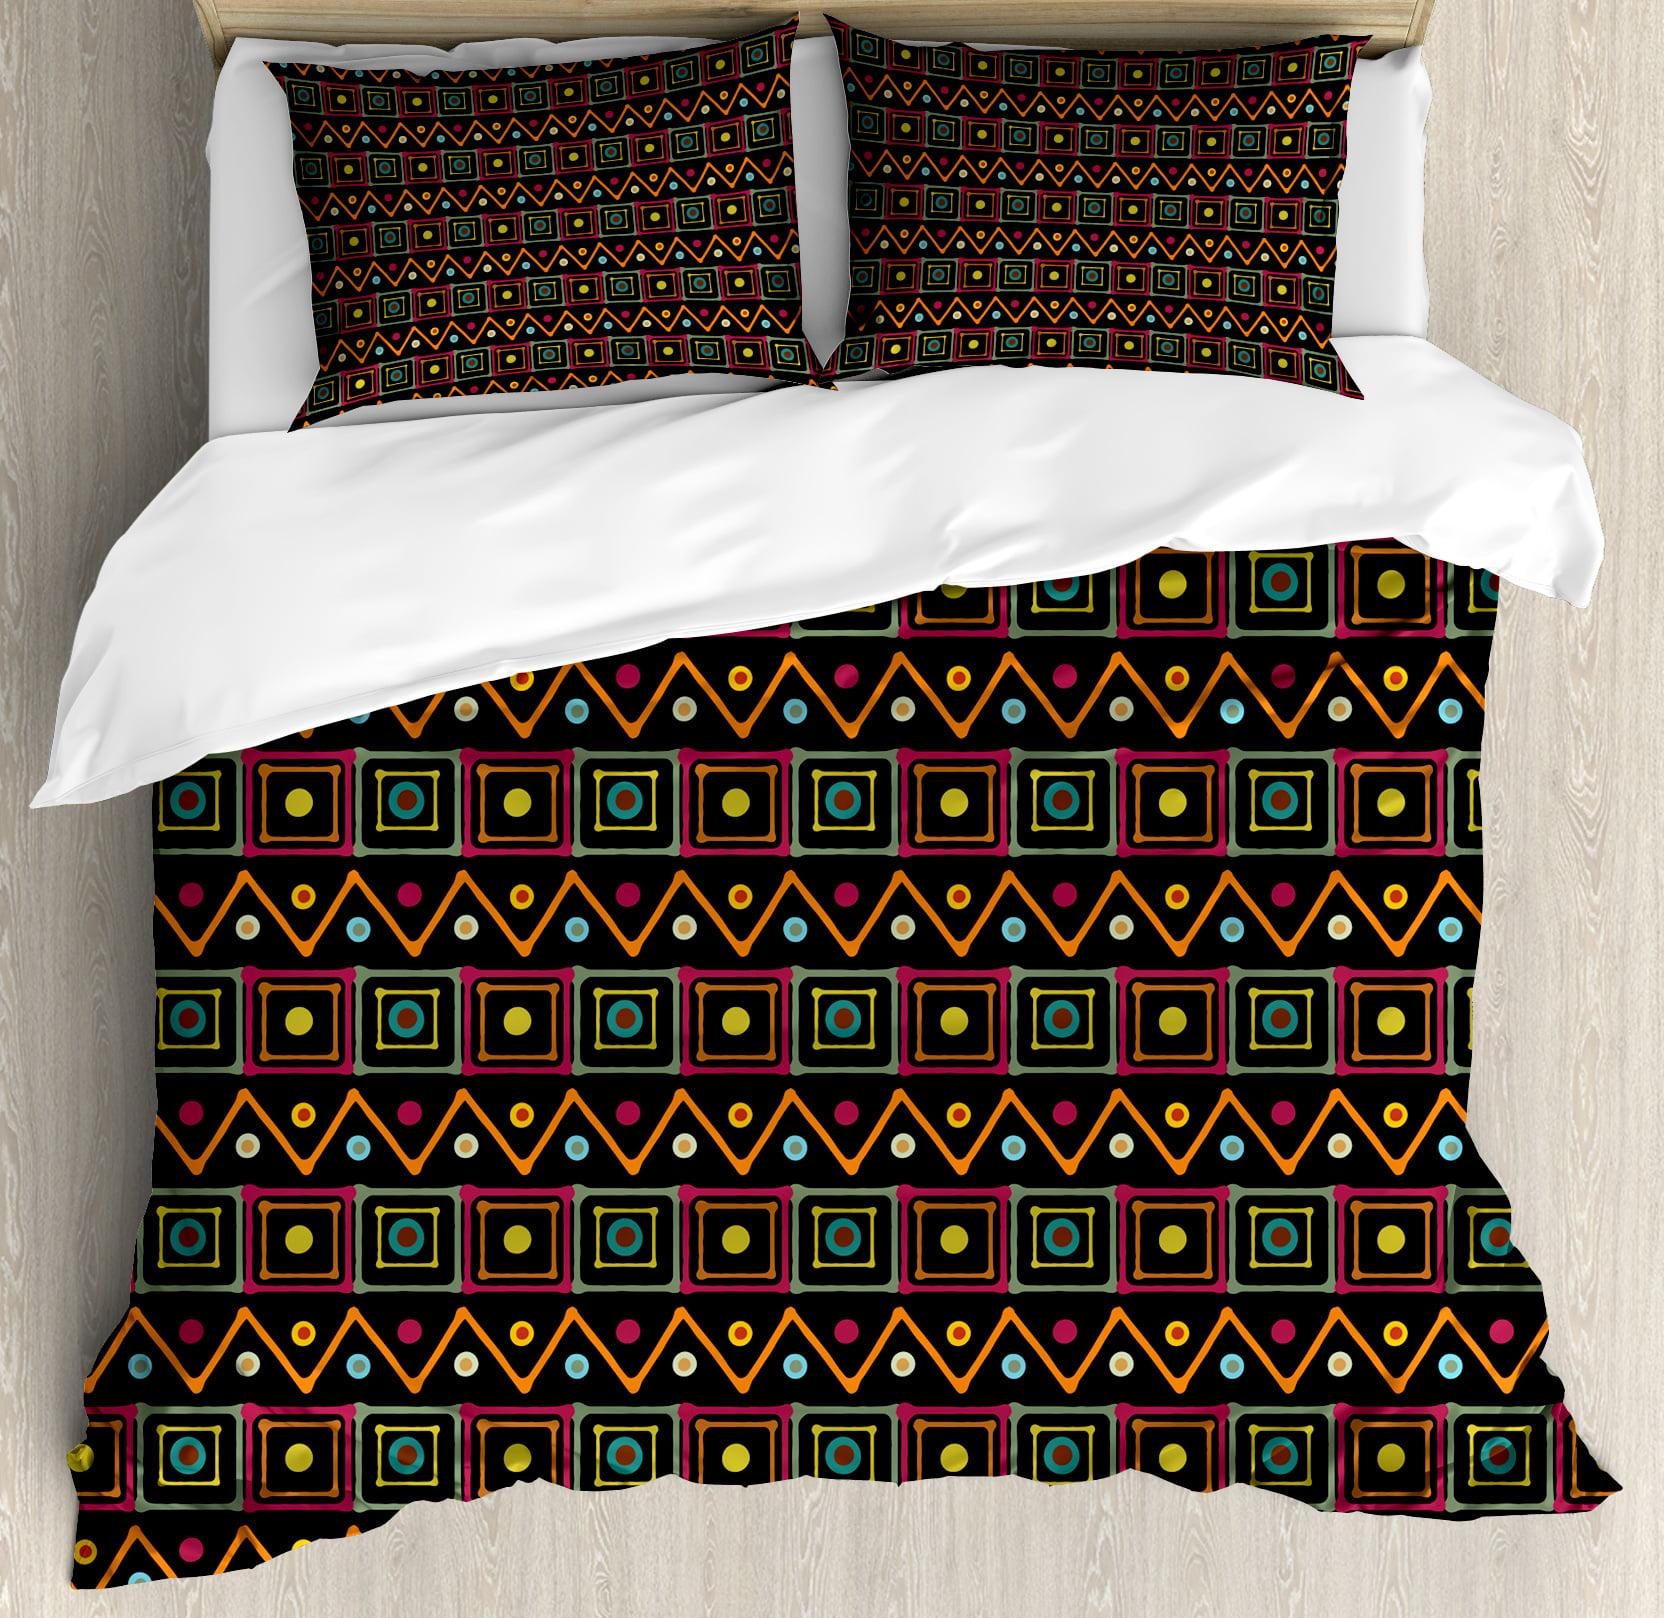 African King Size Duvet Cover Set Tribal Geometric Pattern Squares